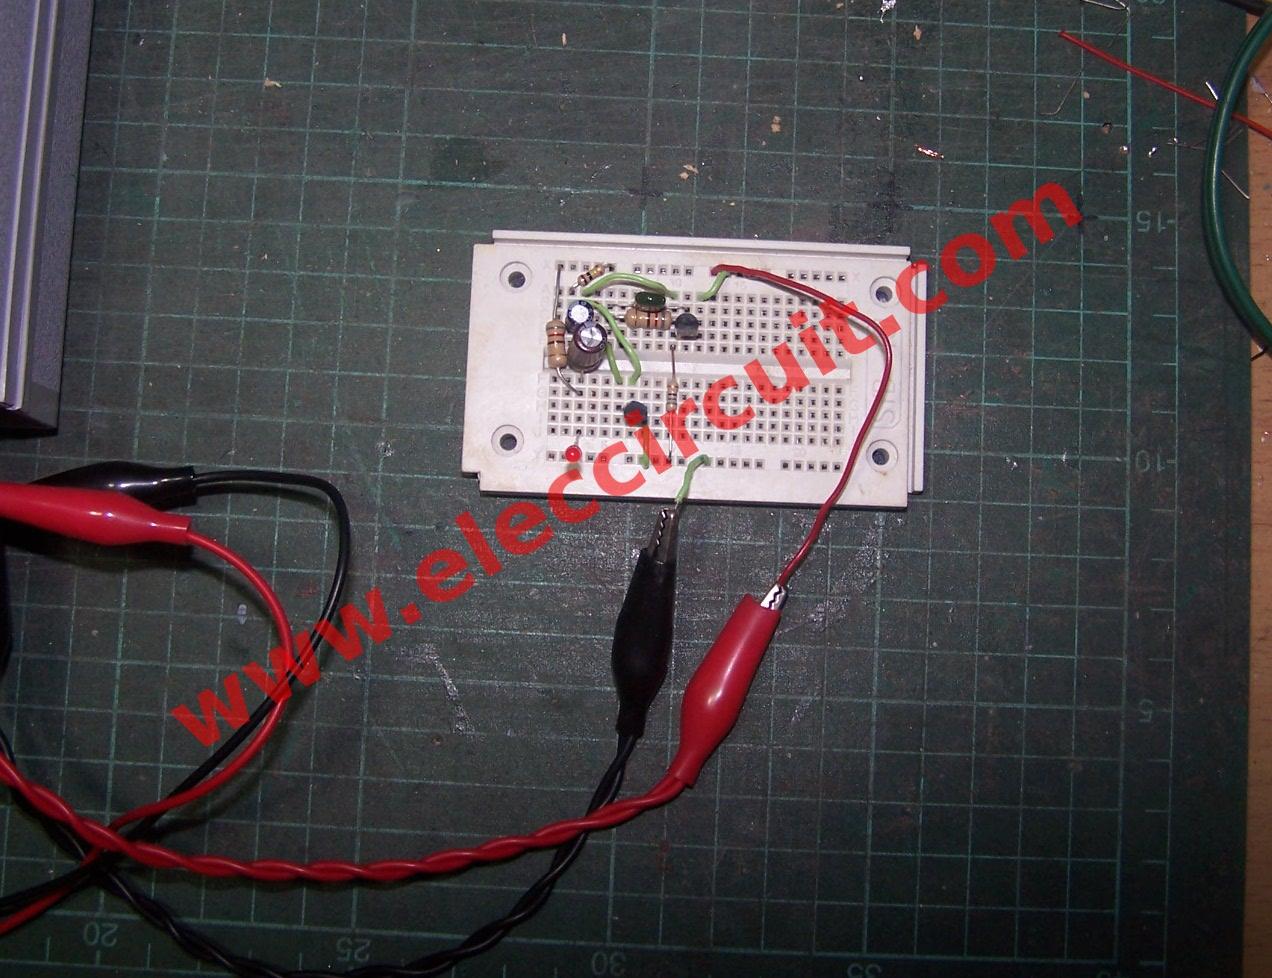 1 5v Led Flasher Circuit Using Bc556 And Bc546